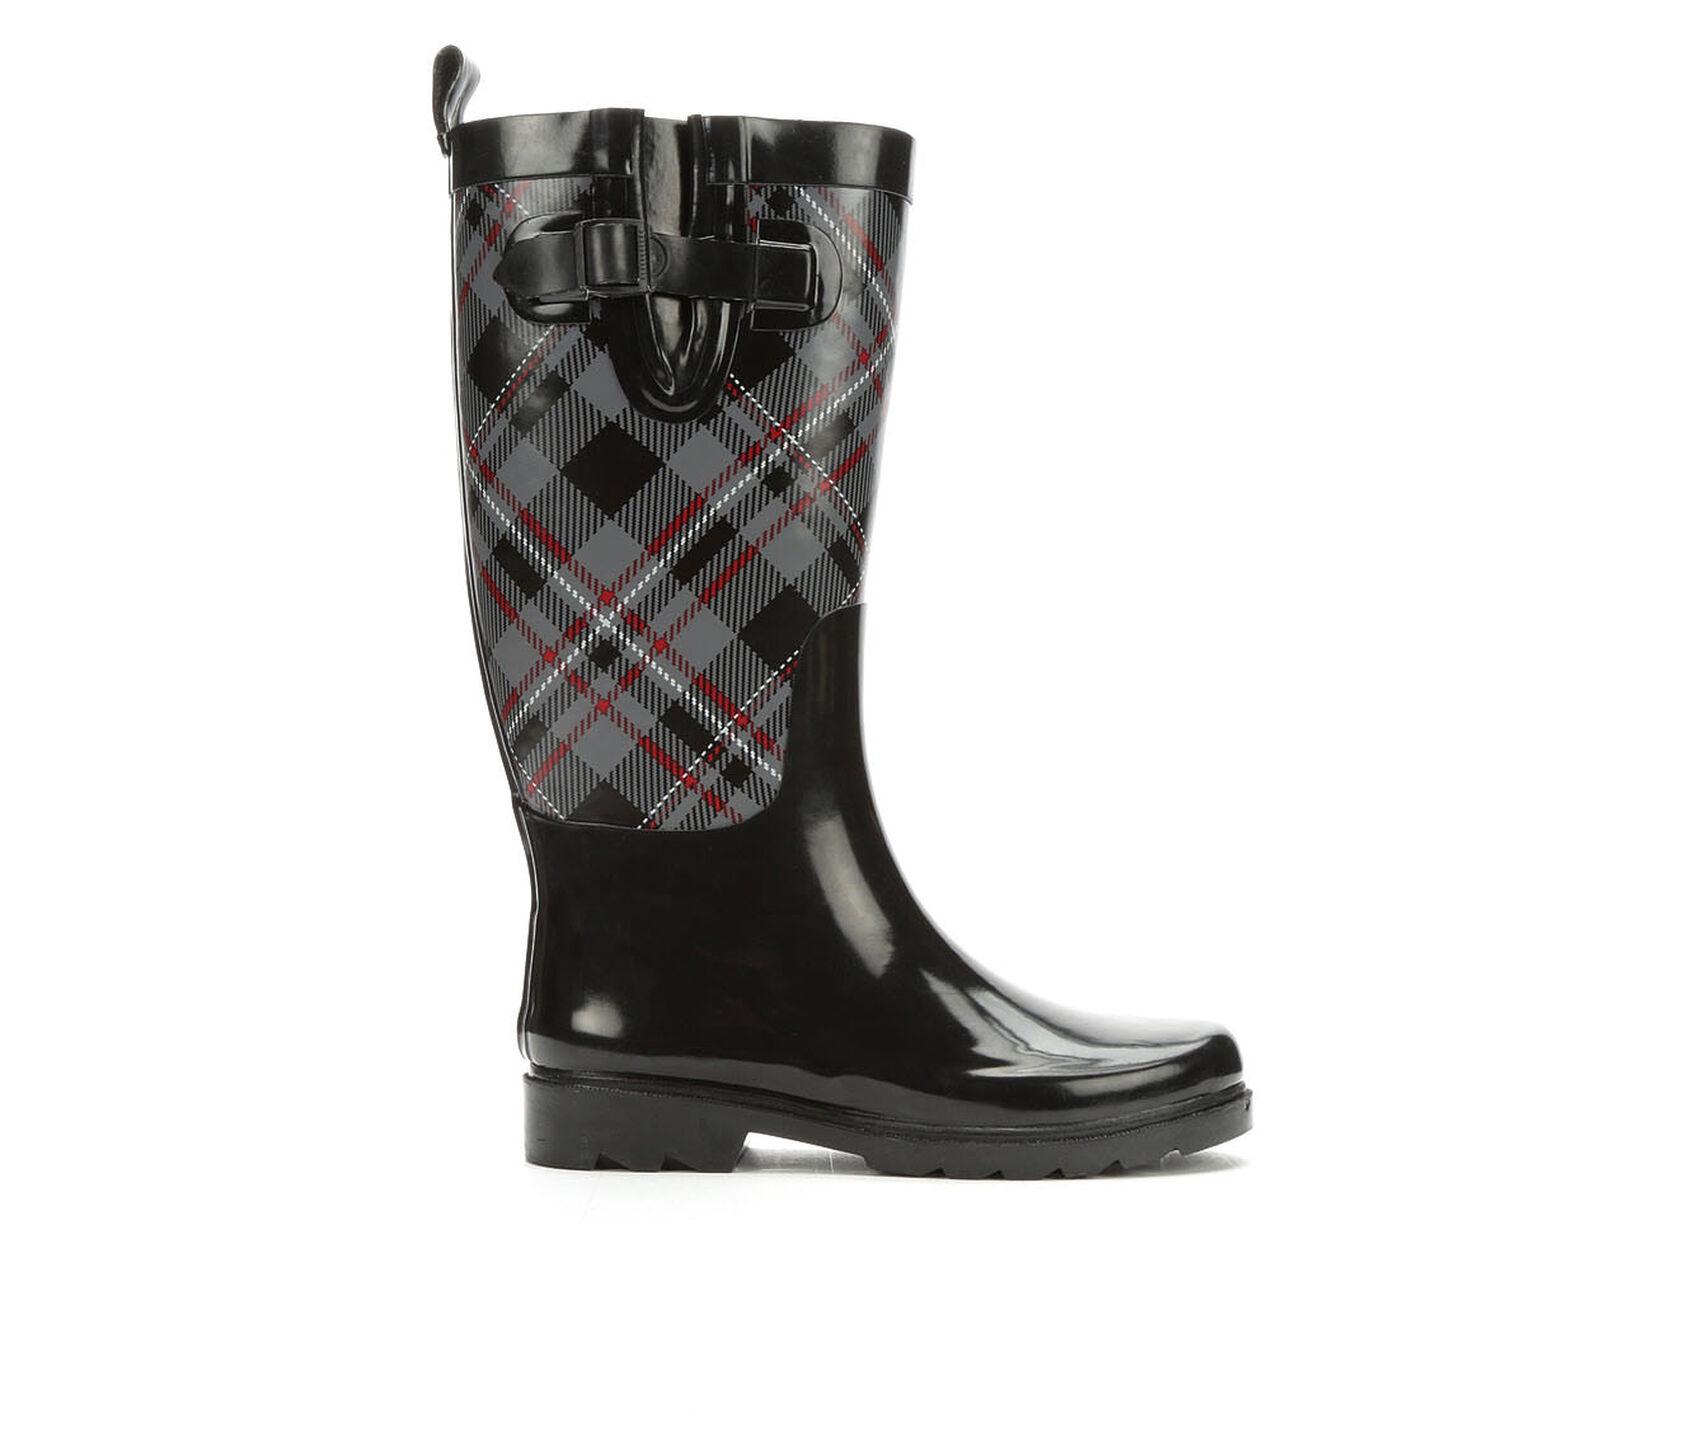 Capelli New York Soho Plaid Rain Boots